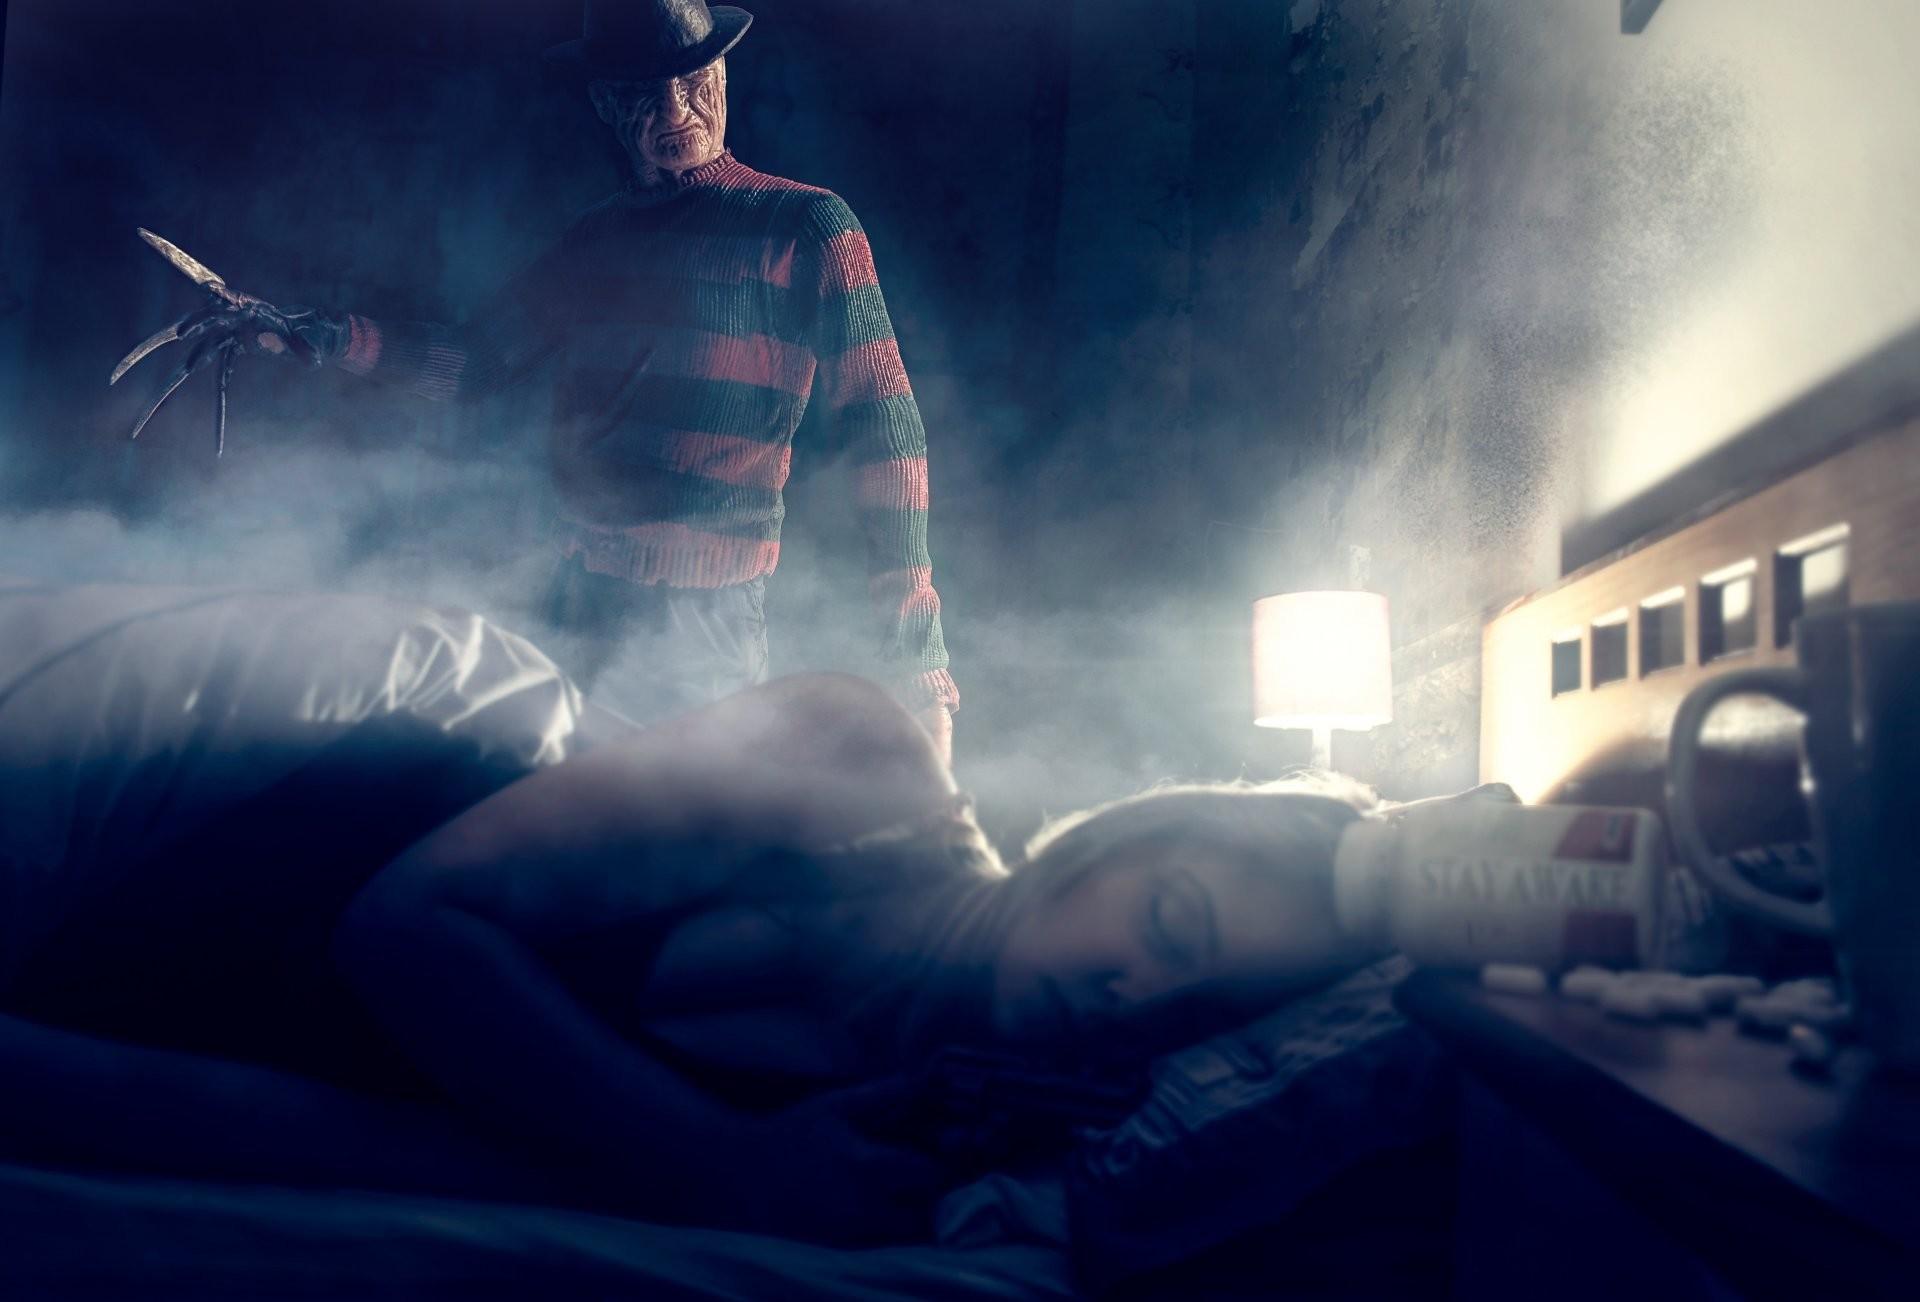 freddy krueger freddy krueger girl sleeping room